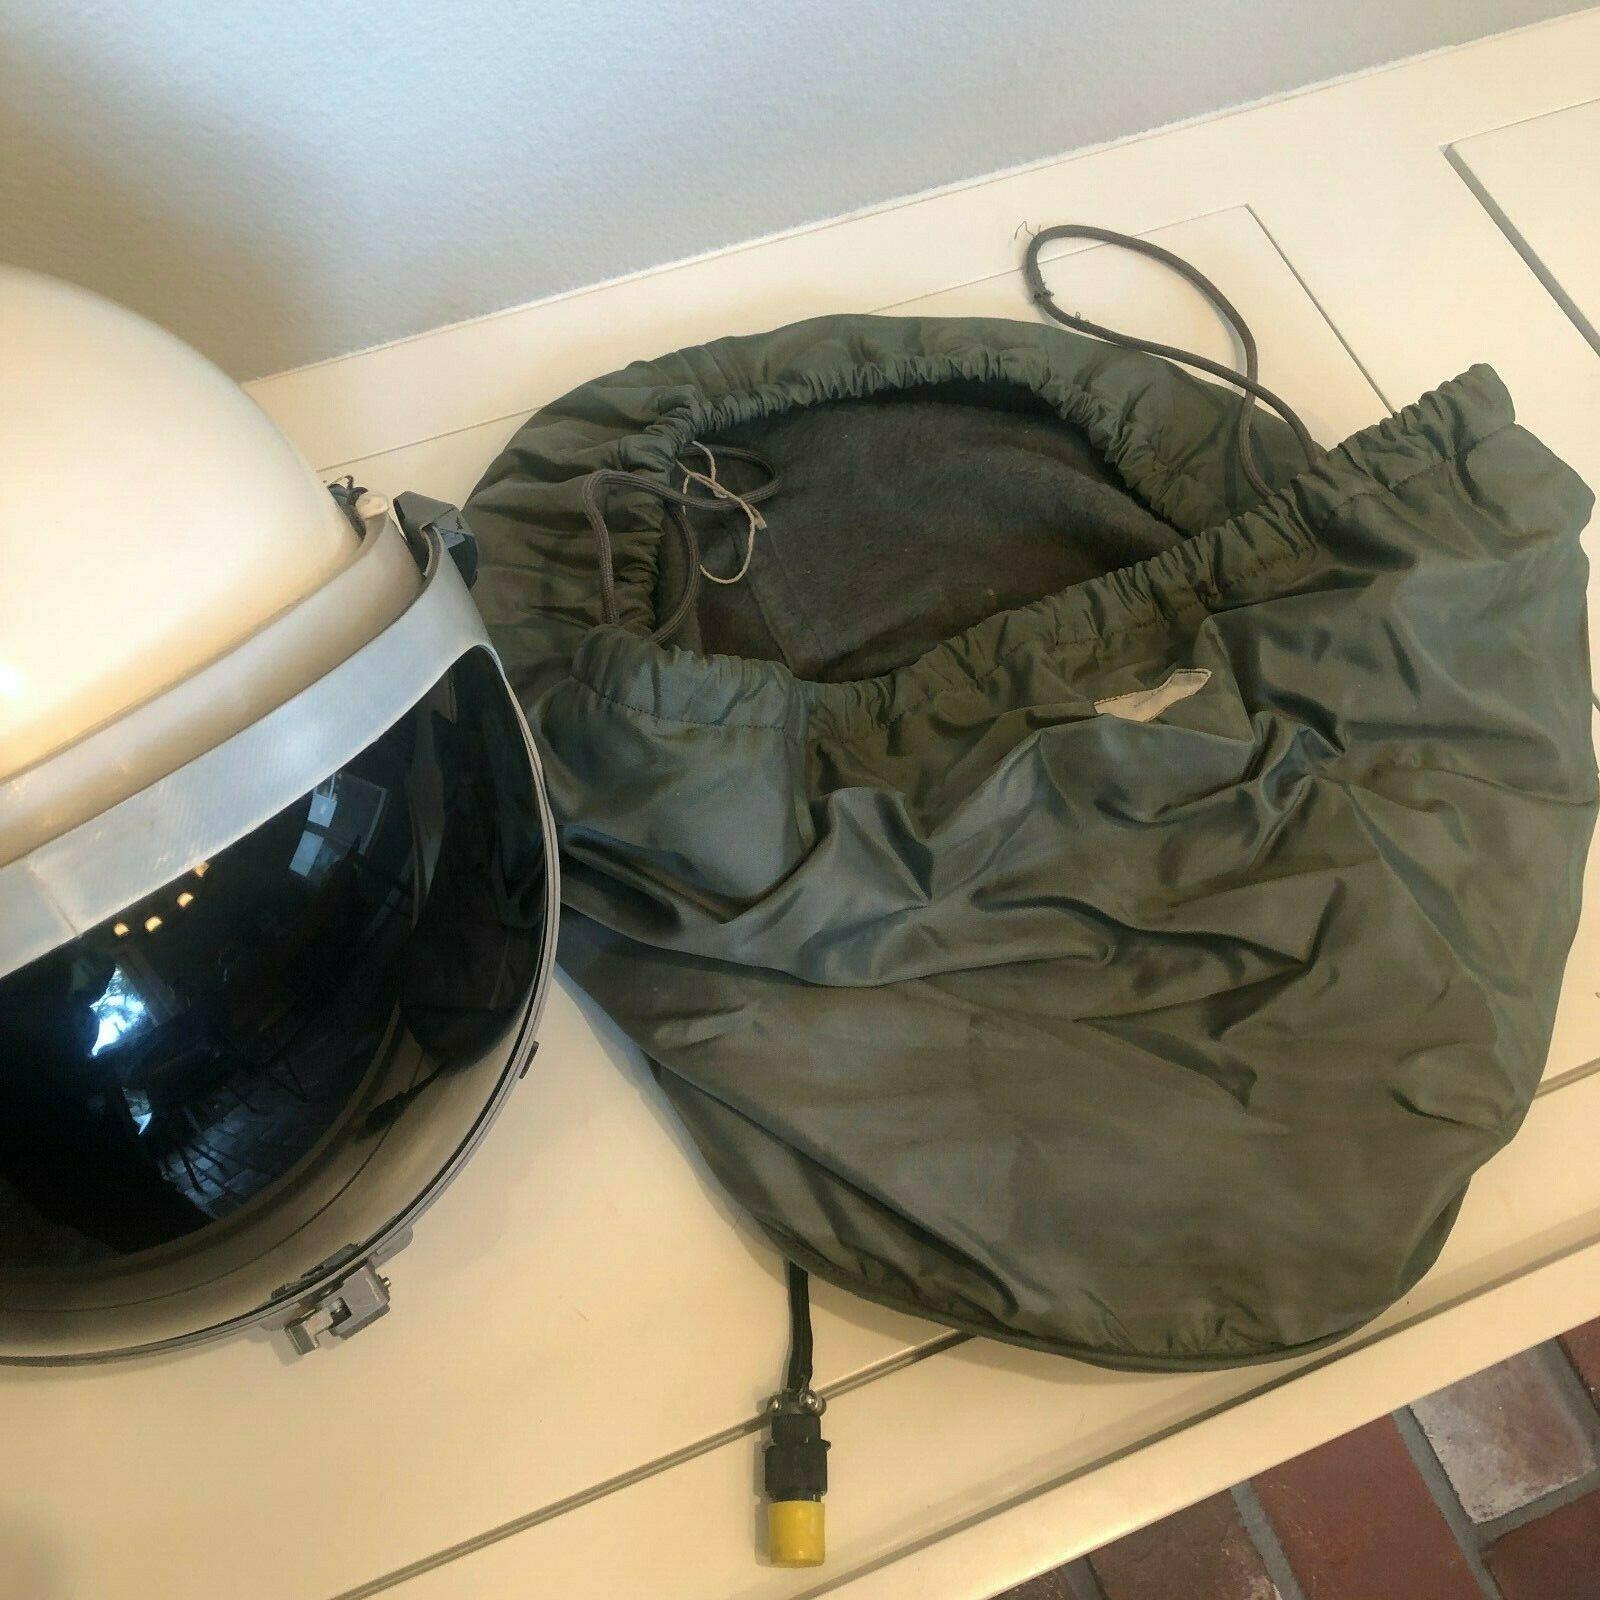 Original SR-71 Blackbird Pilot Helmet available on eBay for US $17,995.00